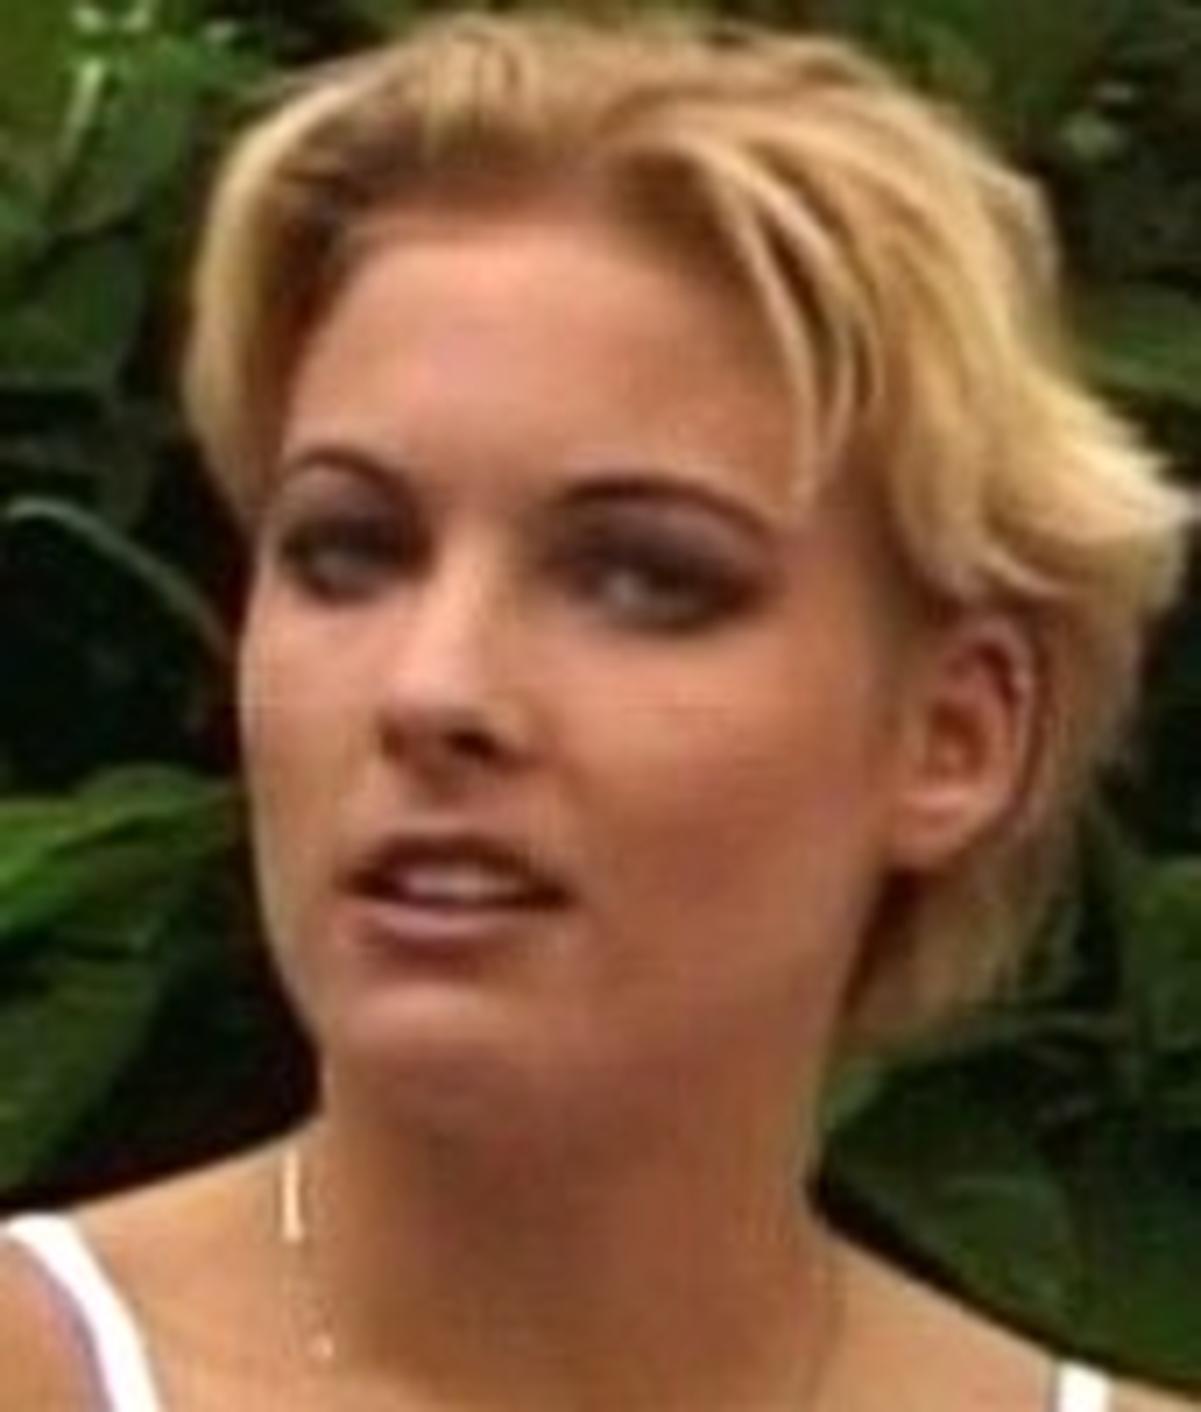 Andersen Porn Actress Swedish jennifer andersson wiki & bio - pornographic actress